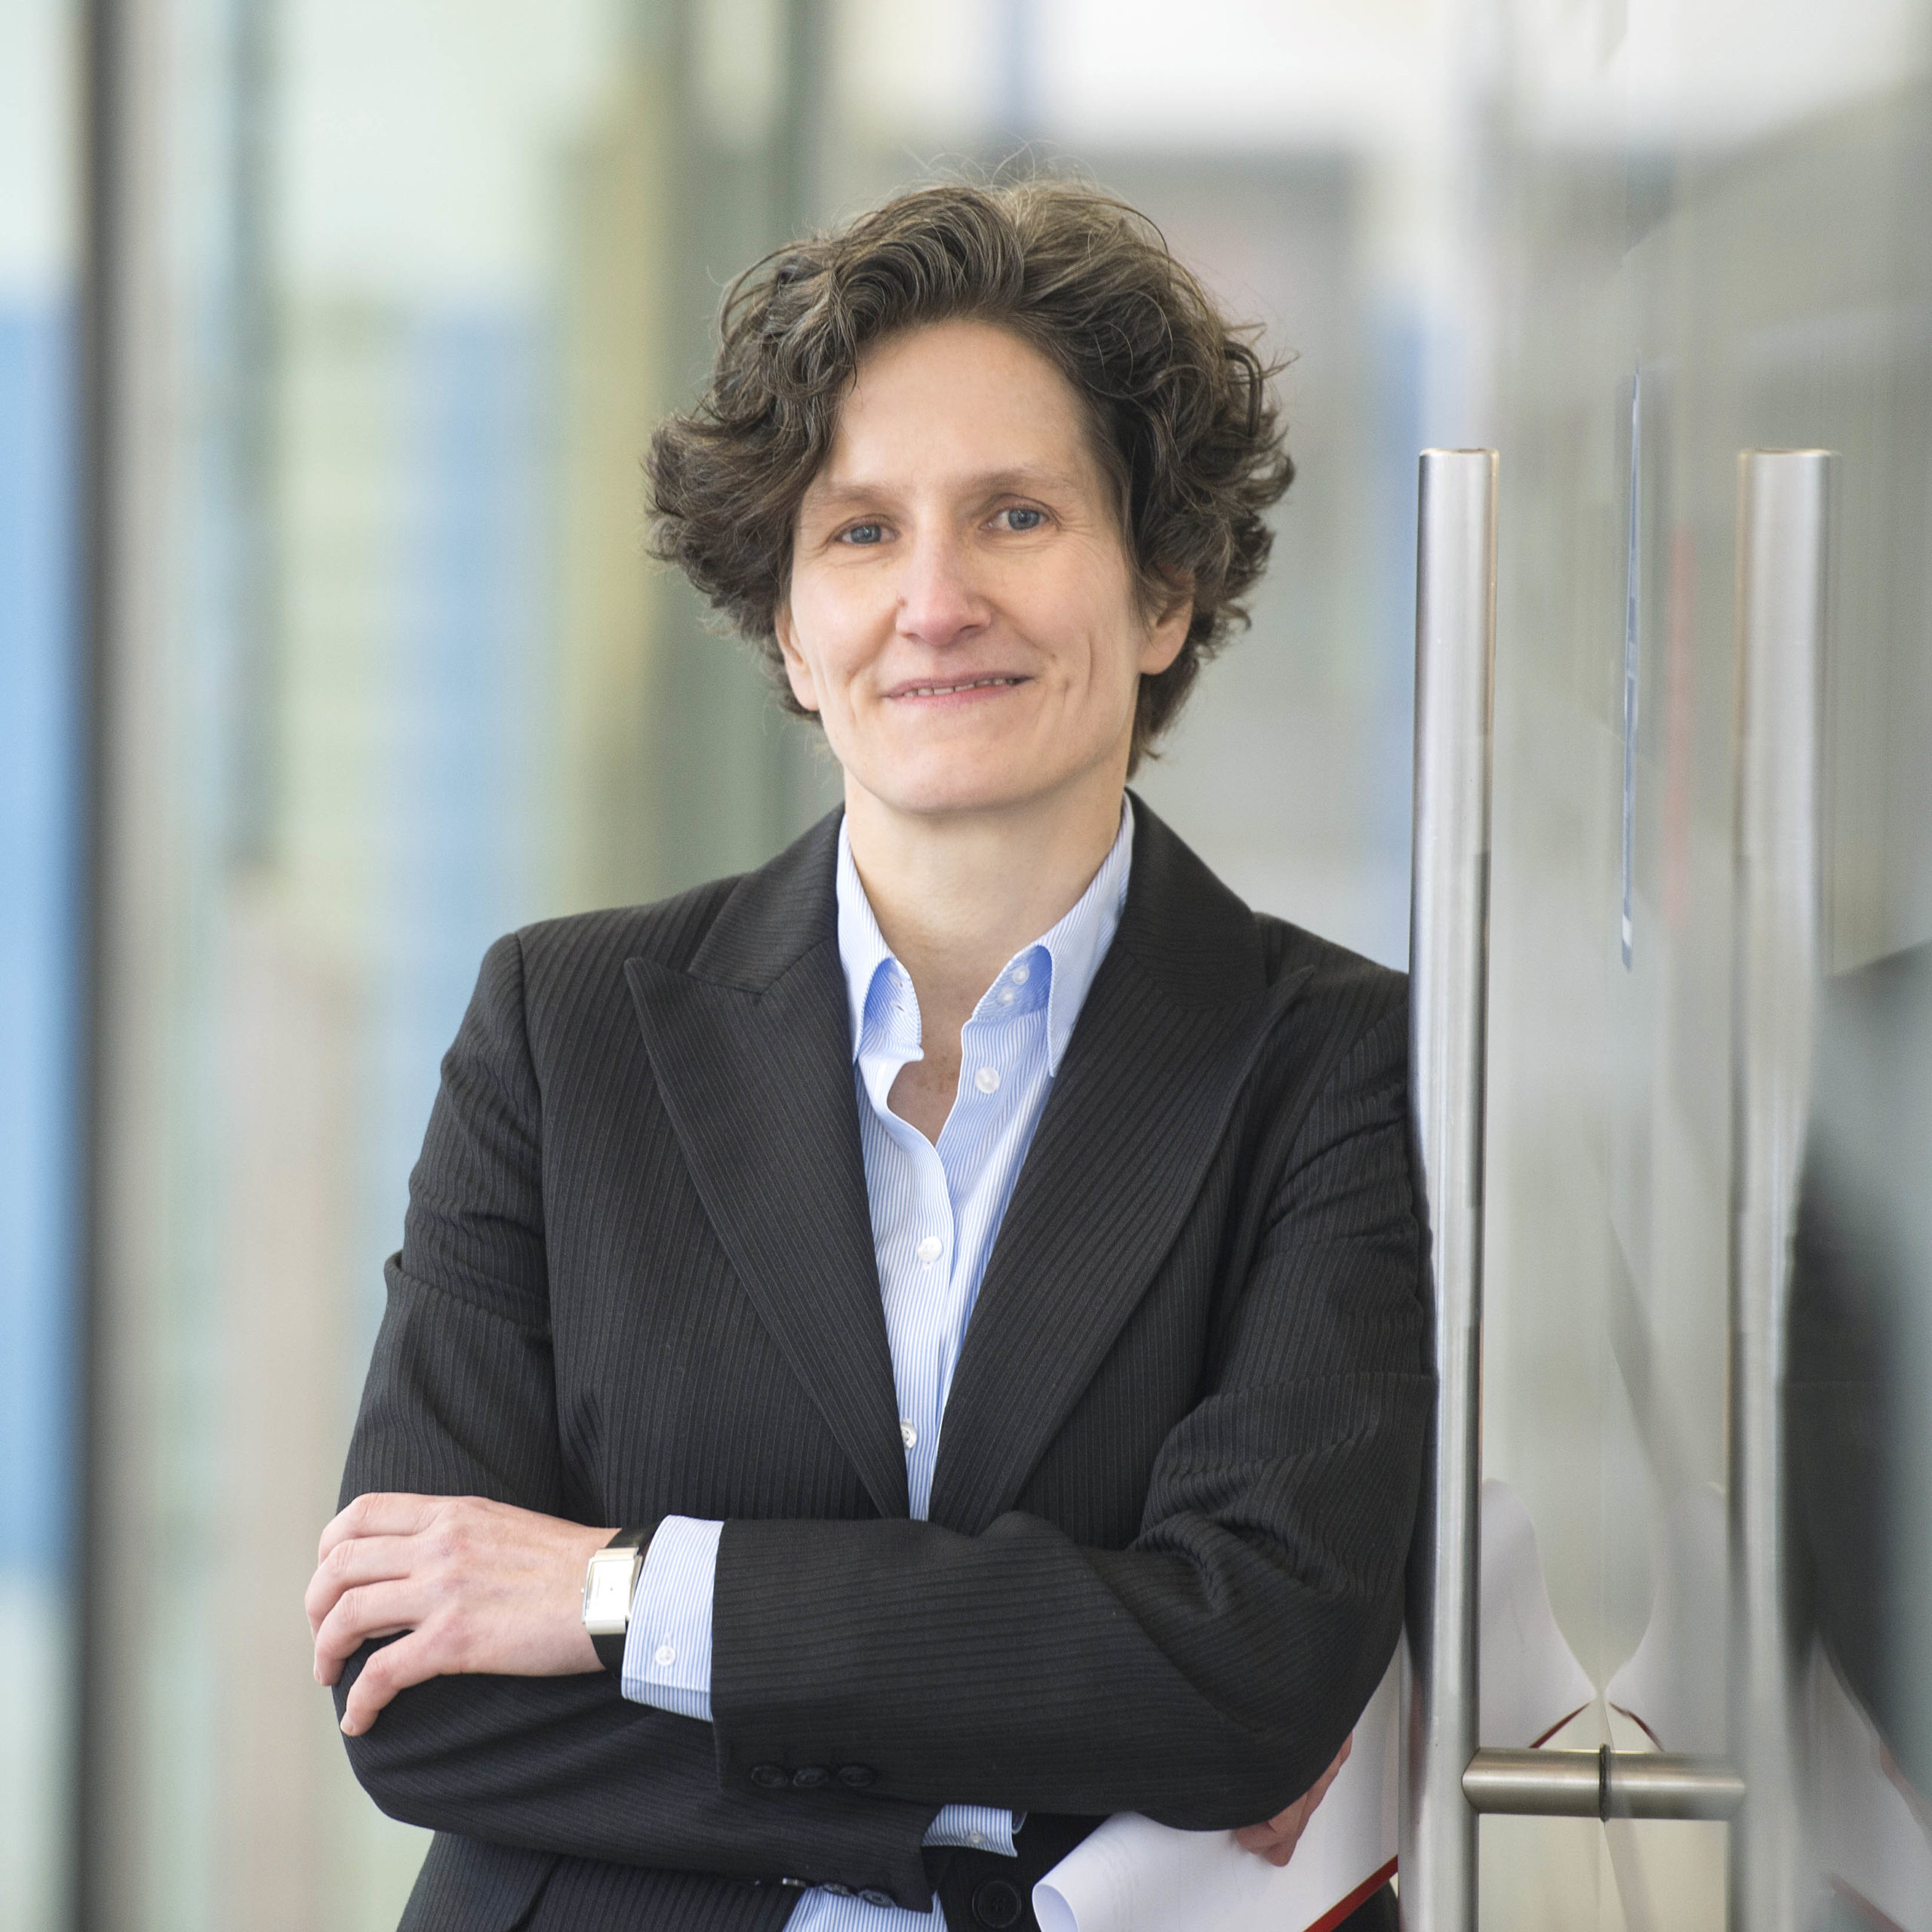 Dr. Ulrike Neubauer